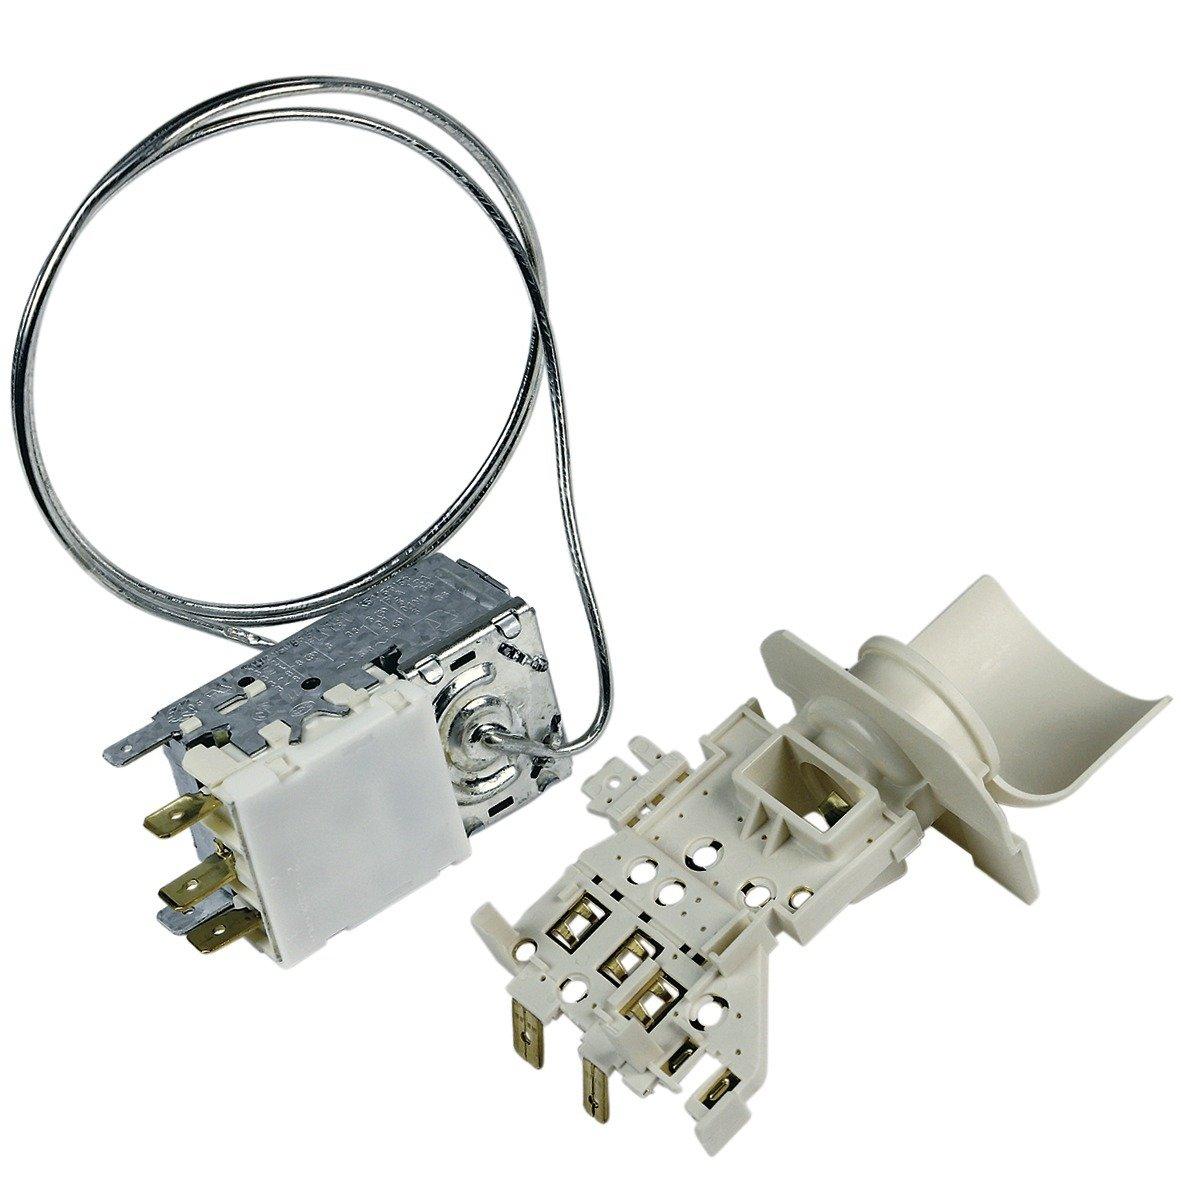 Original Thermostat Kühlschrank Ranco K59-S2785 690mm Kapillarrohr Umbausatz